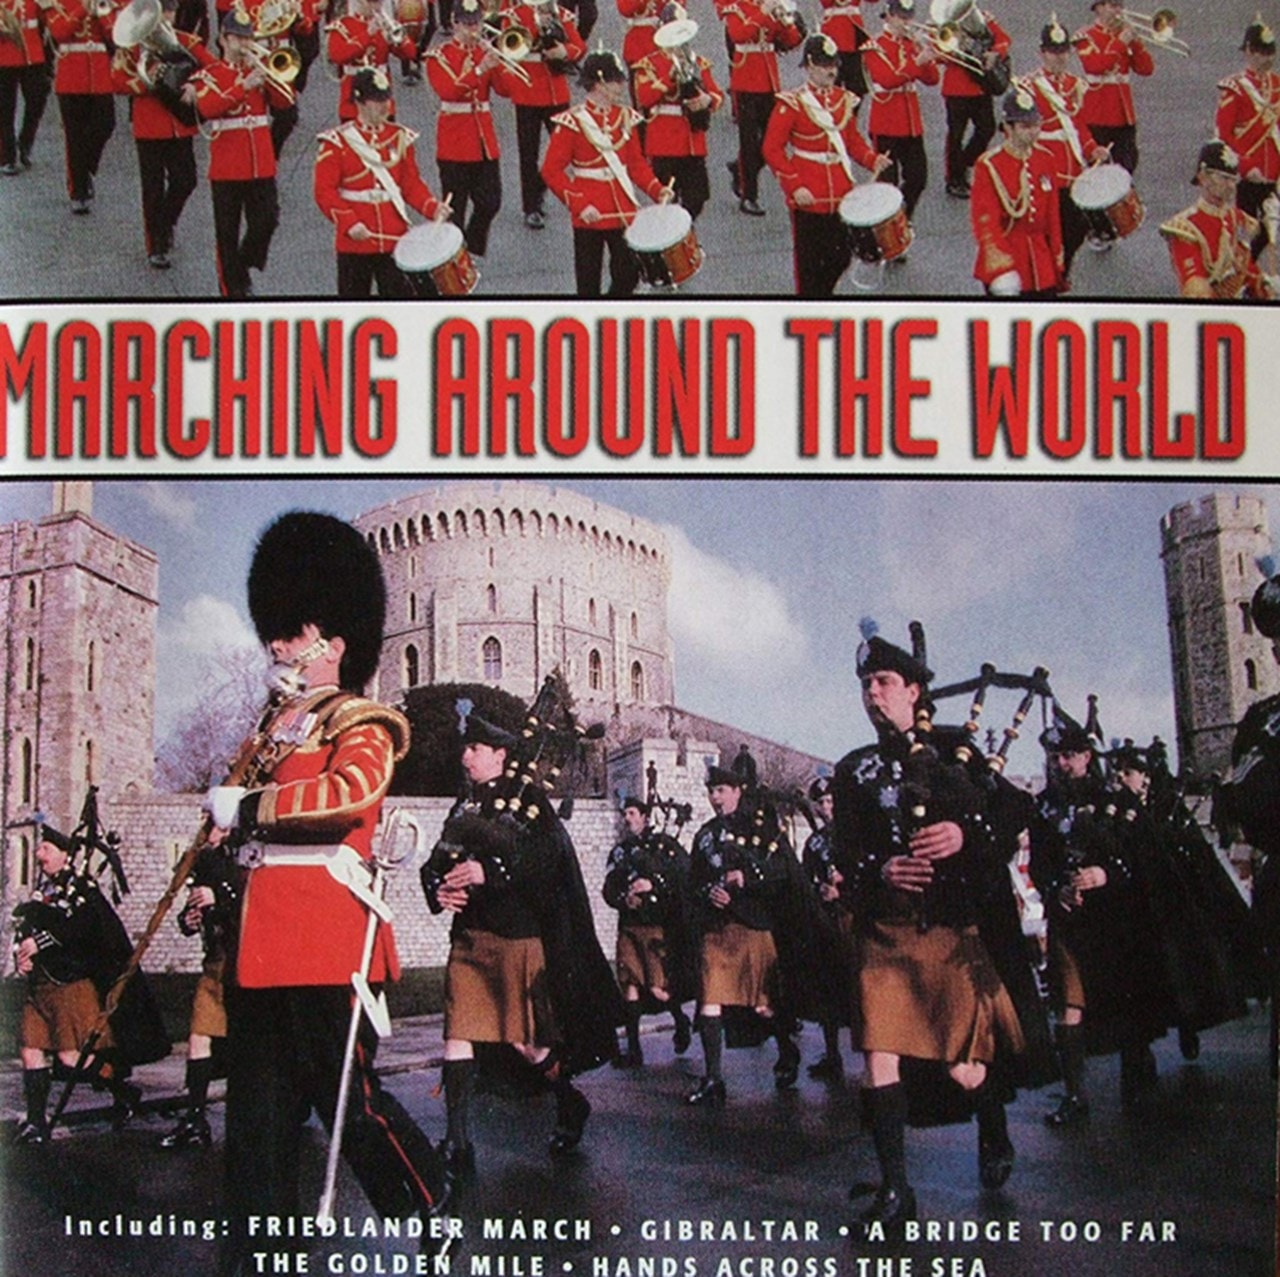 Marching Around the World - 1